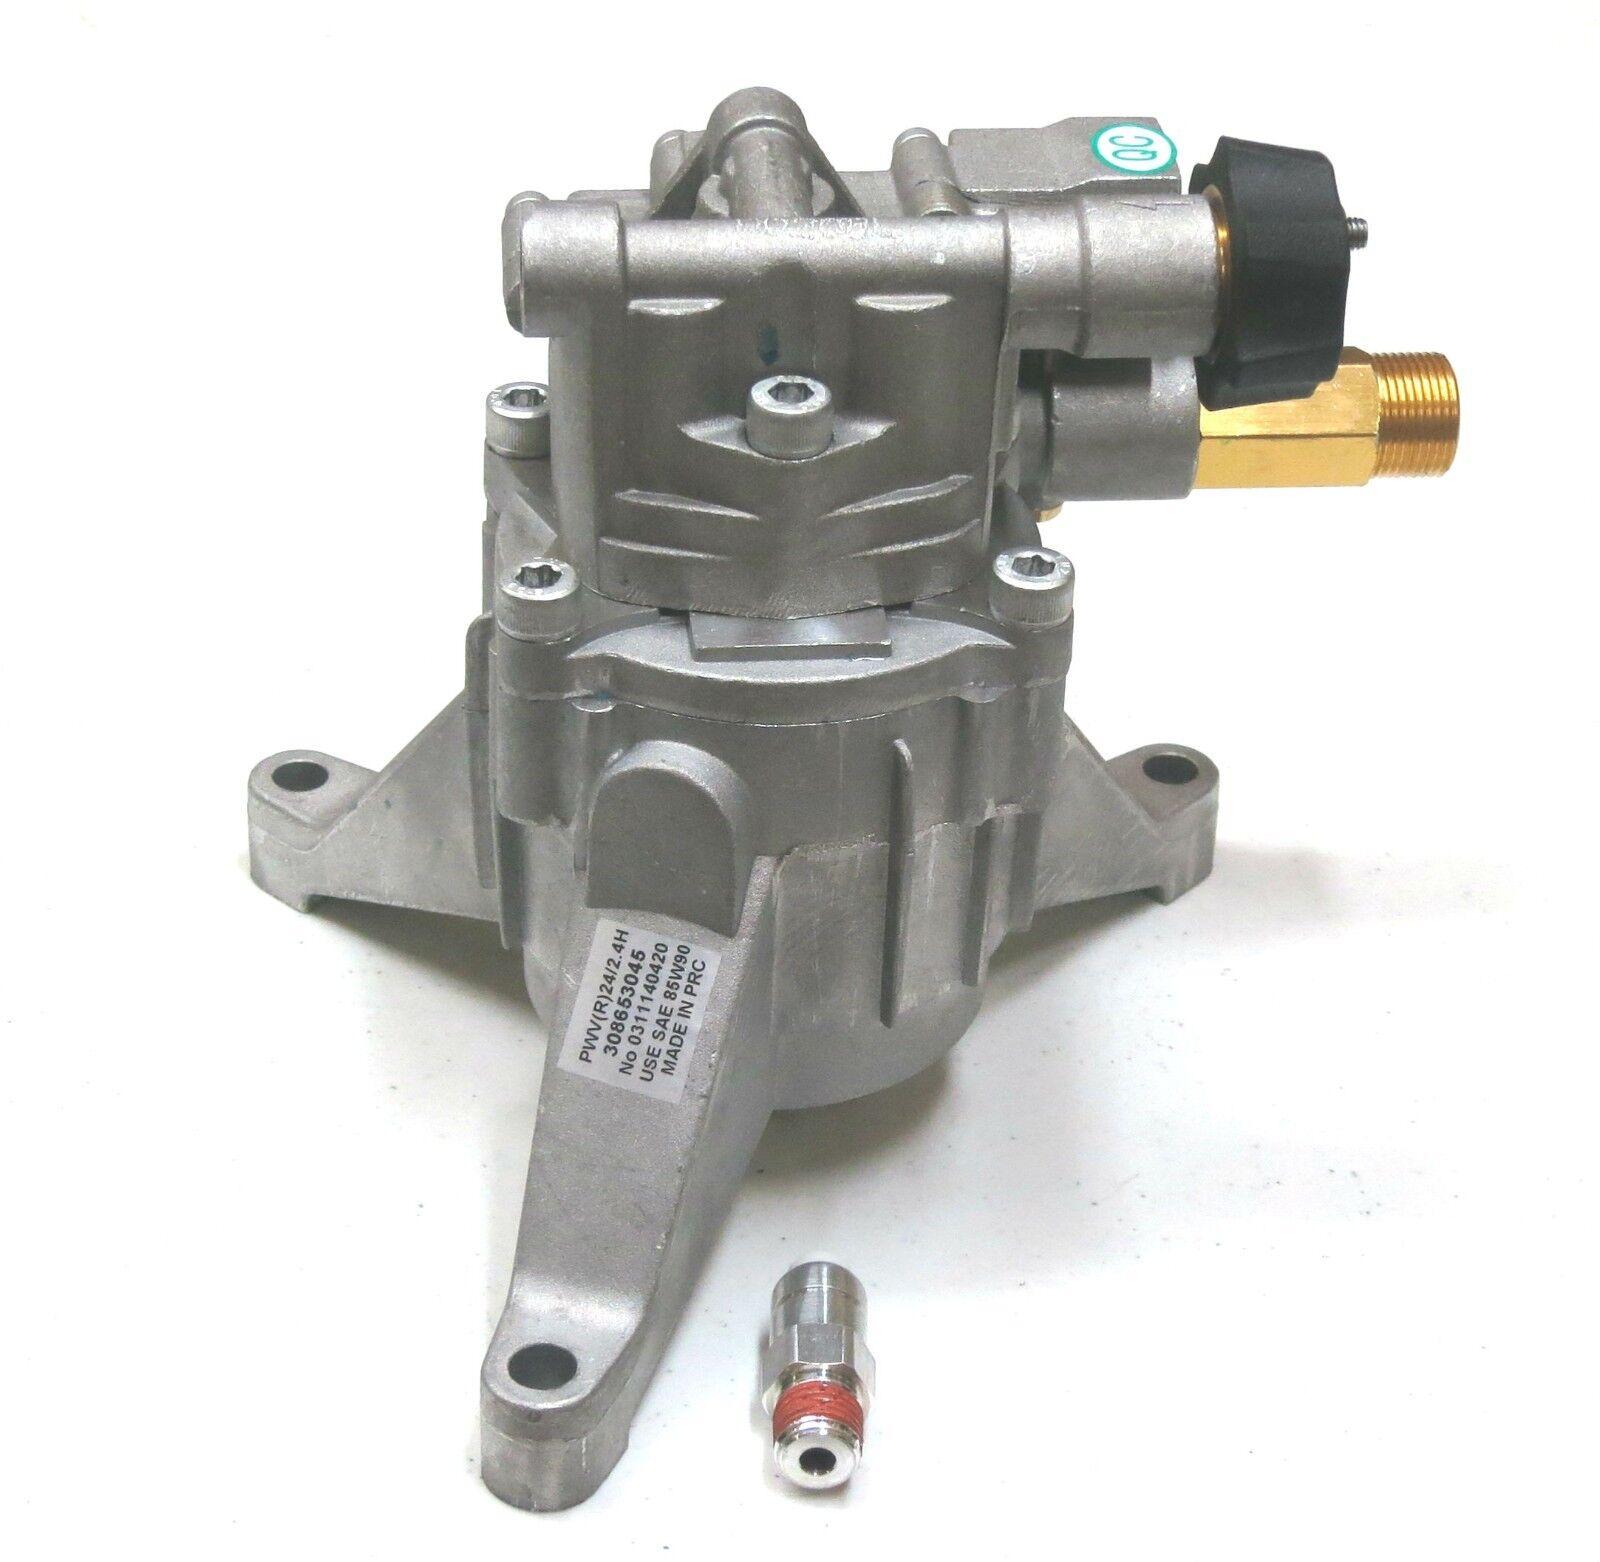 troy bilt pressure washer parts diagram toyota pickup wiring new 2800 psi power water pump